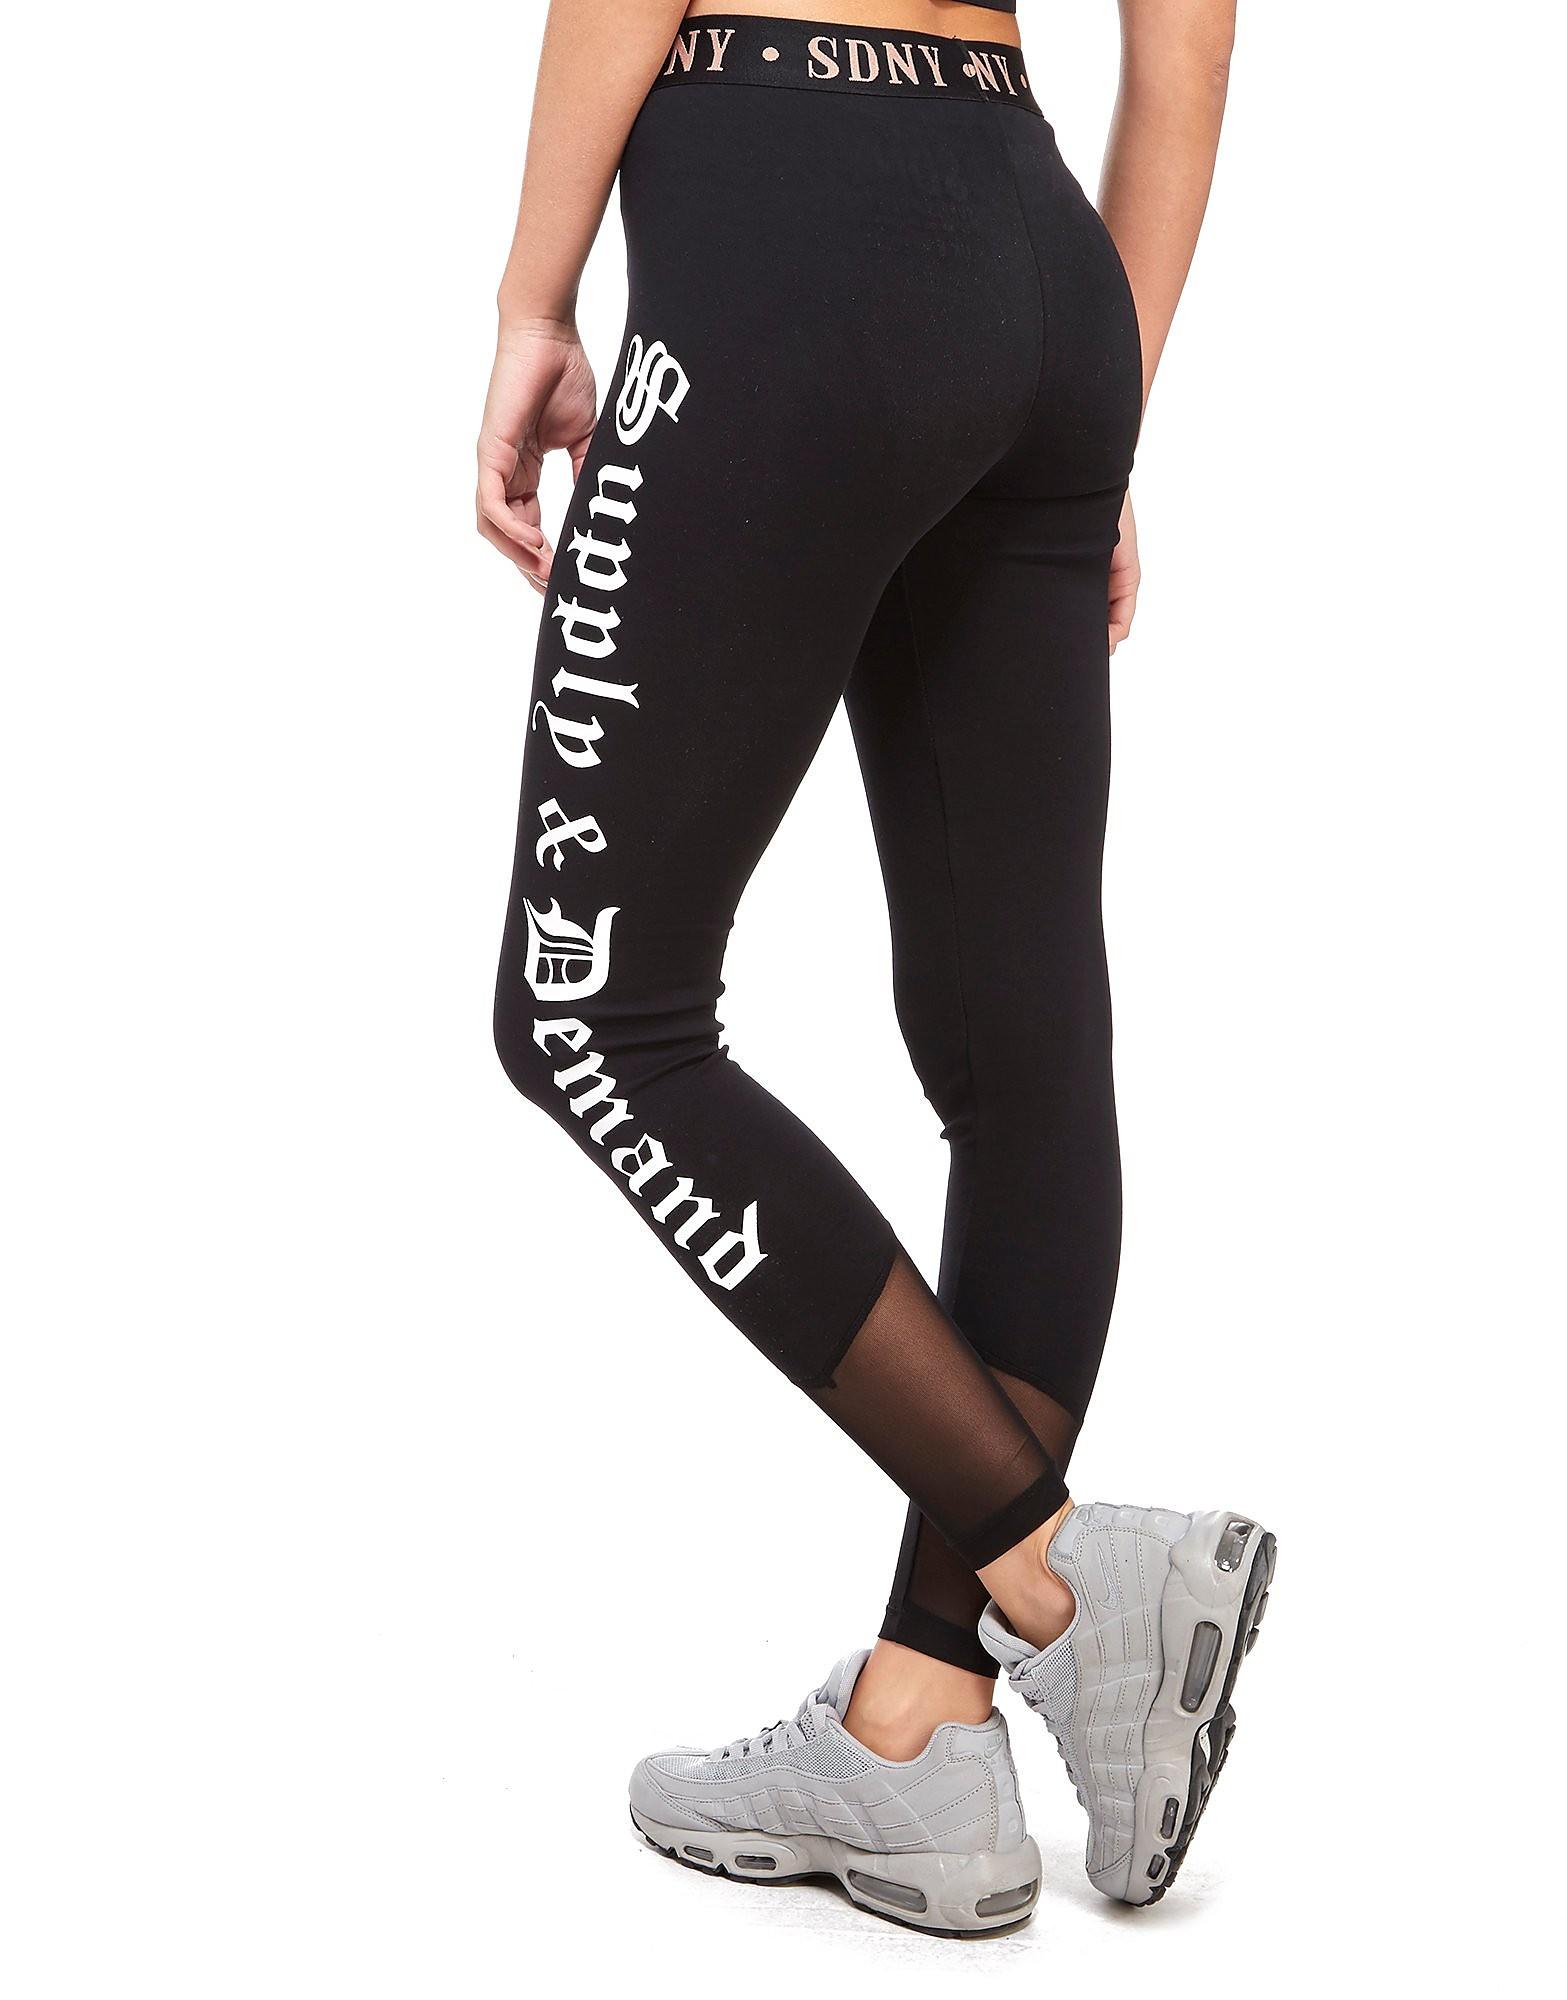 Supply & Demand Logo Legging